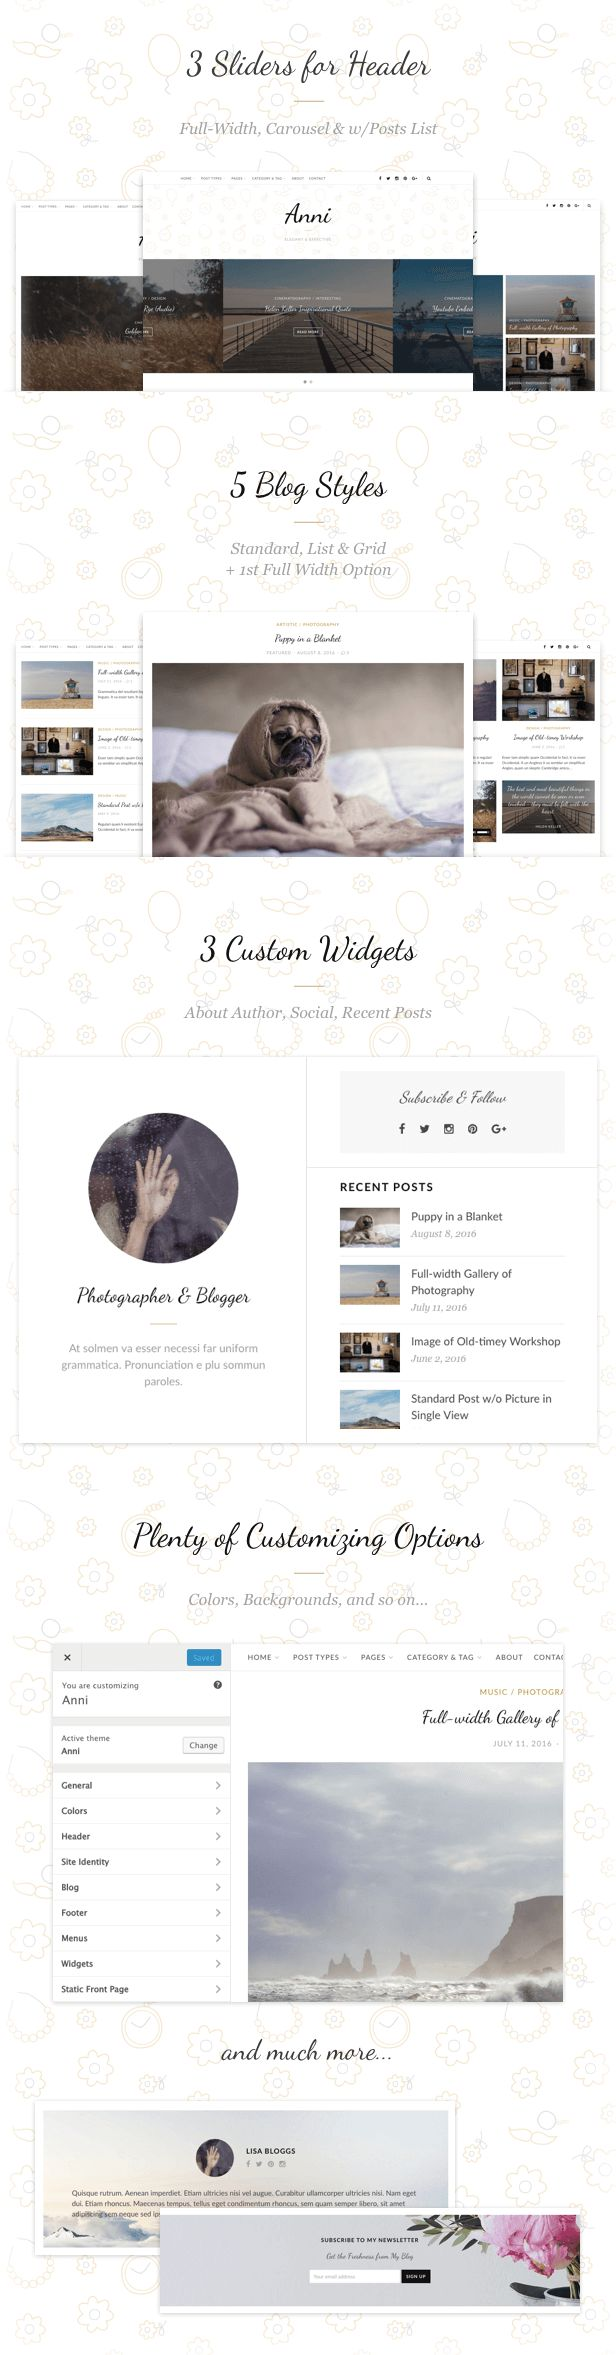 Anni – An Elegant & Effective WordPress Personal Theme by ThemeAB | ThemeForest